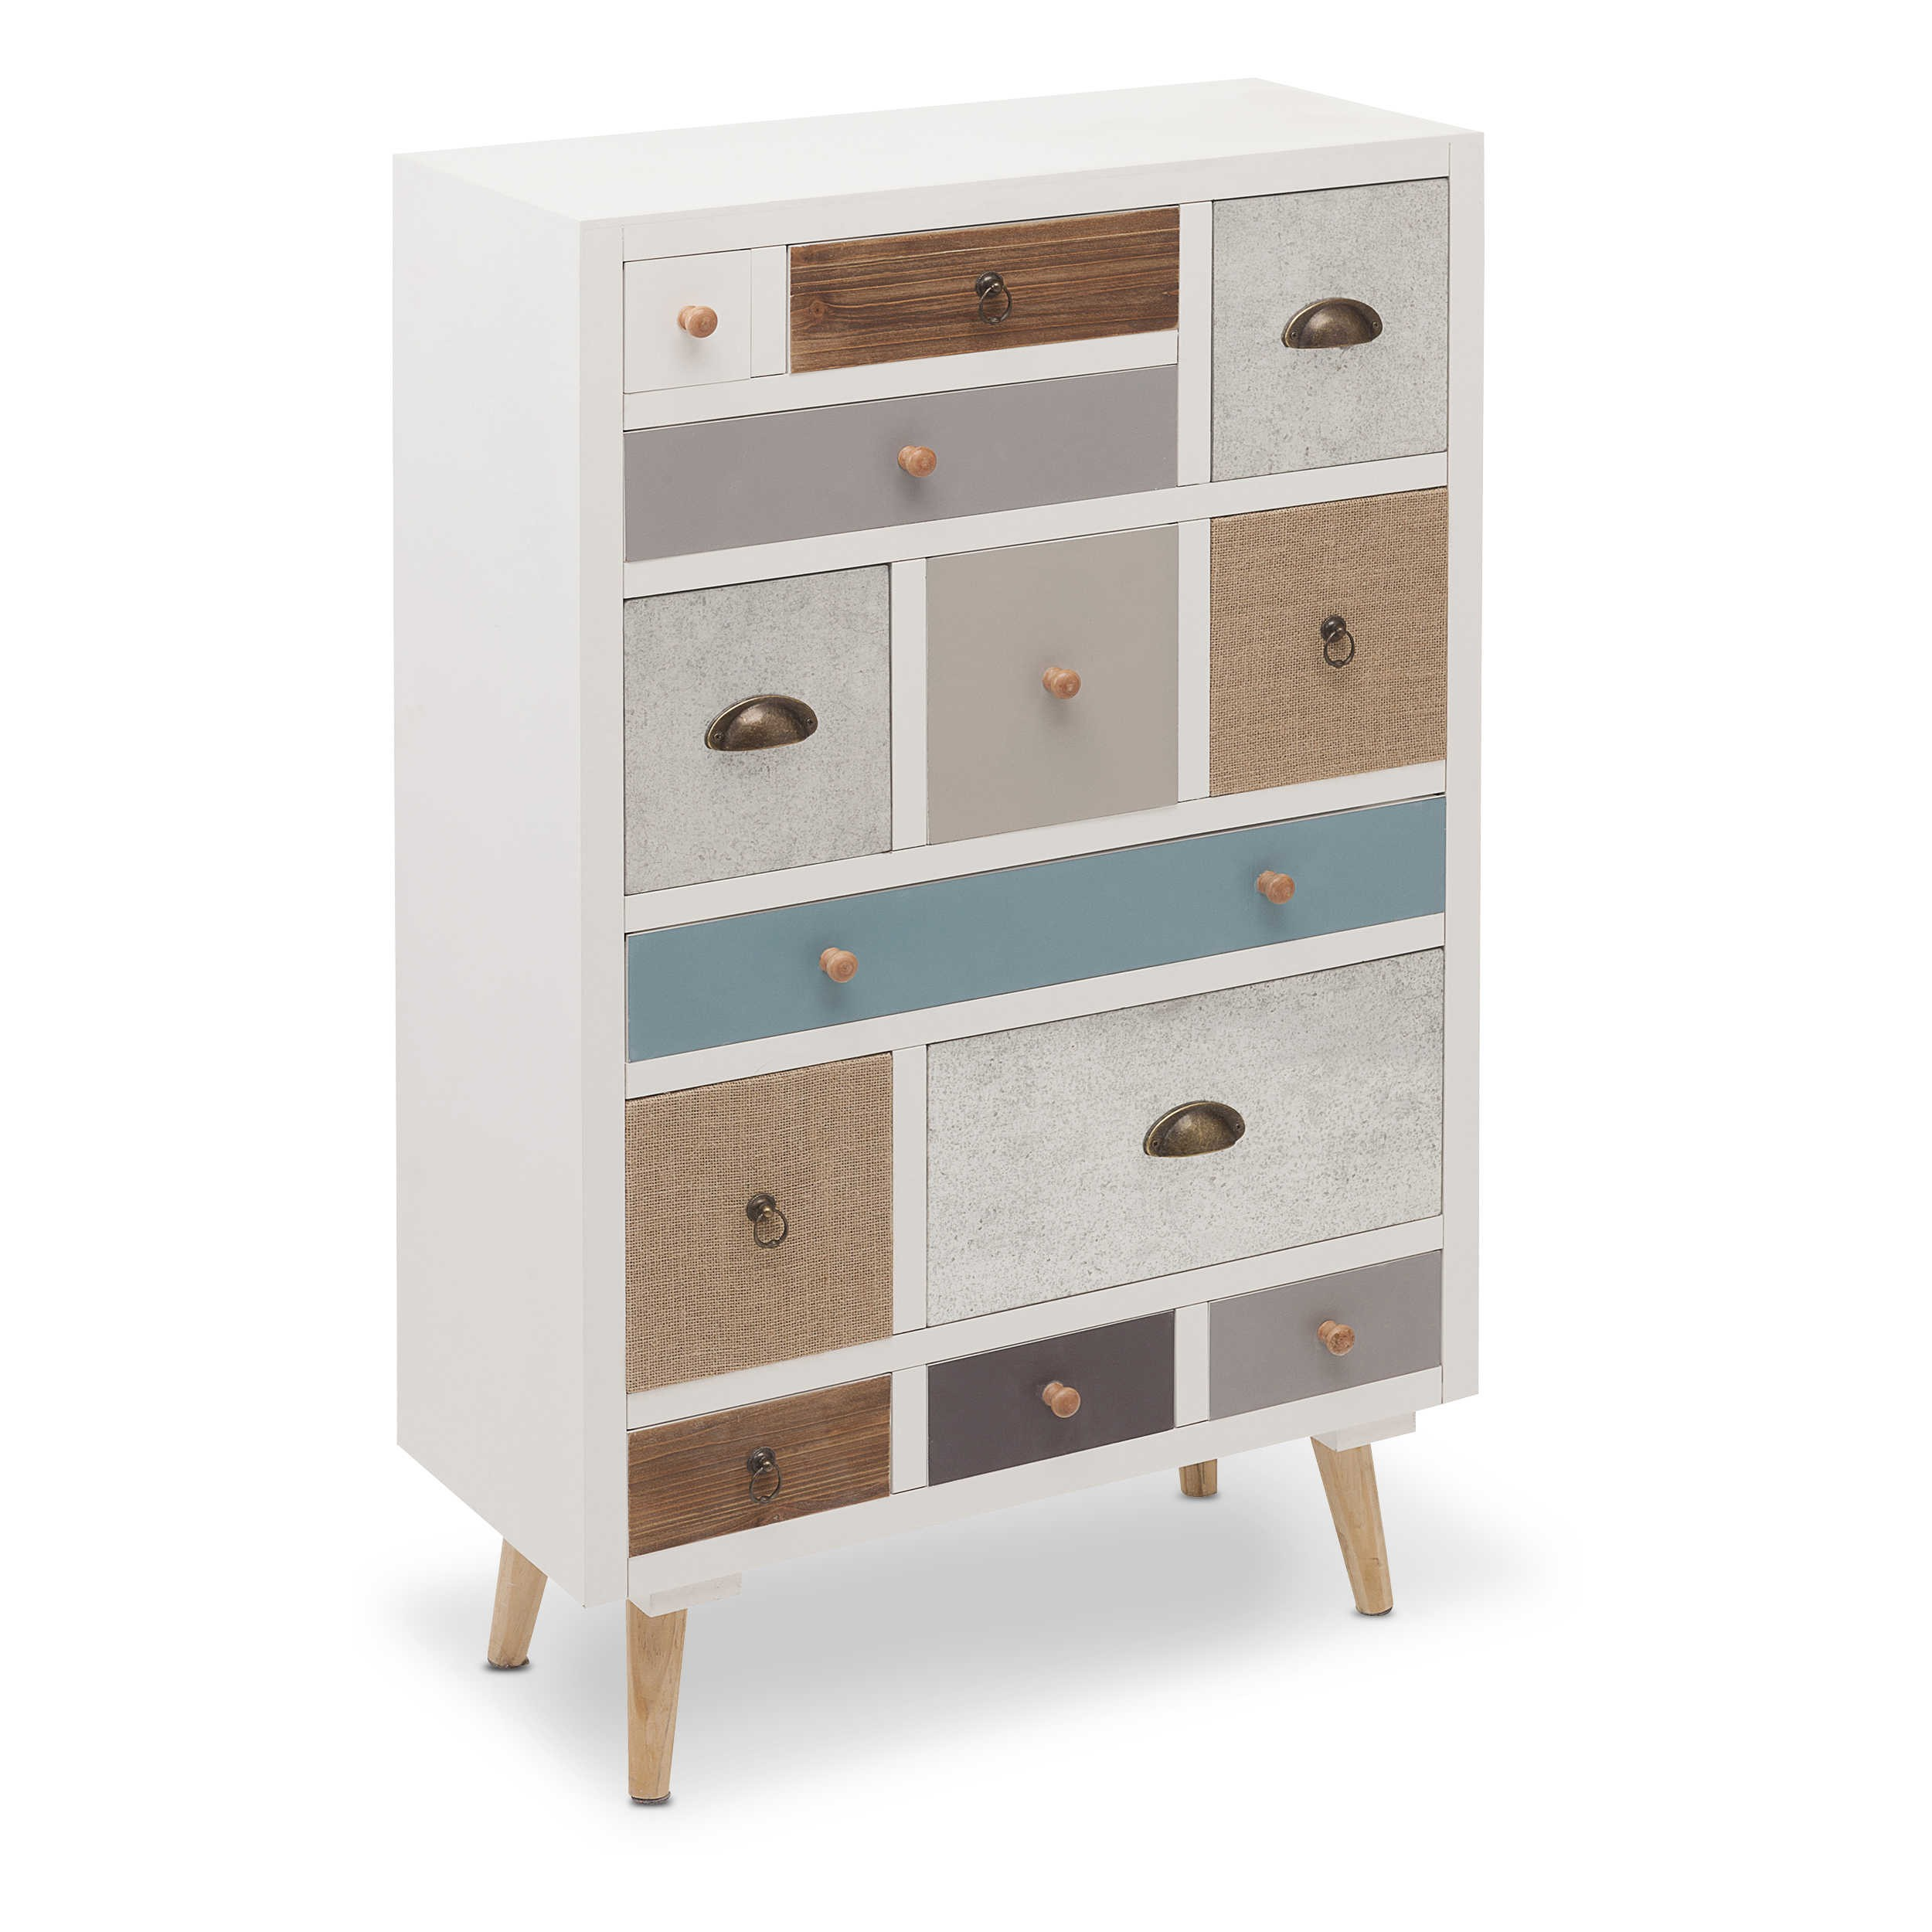 actona kommode thais bunt lack hochglanz online kaufen. Black Bedroom Furniture Sets. Home Design Ideas